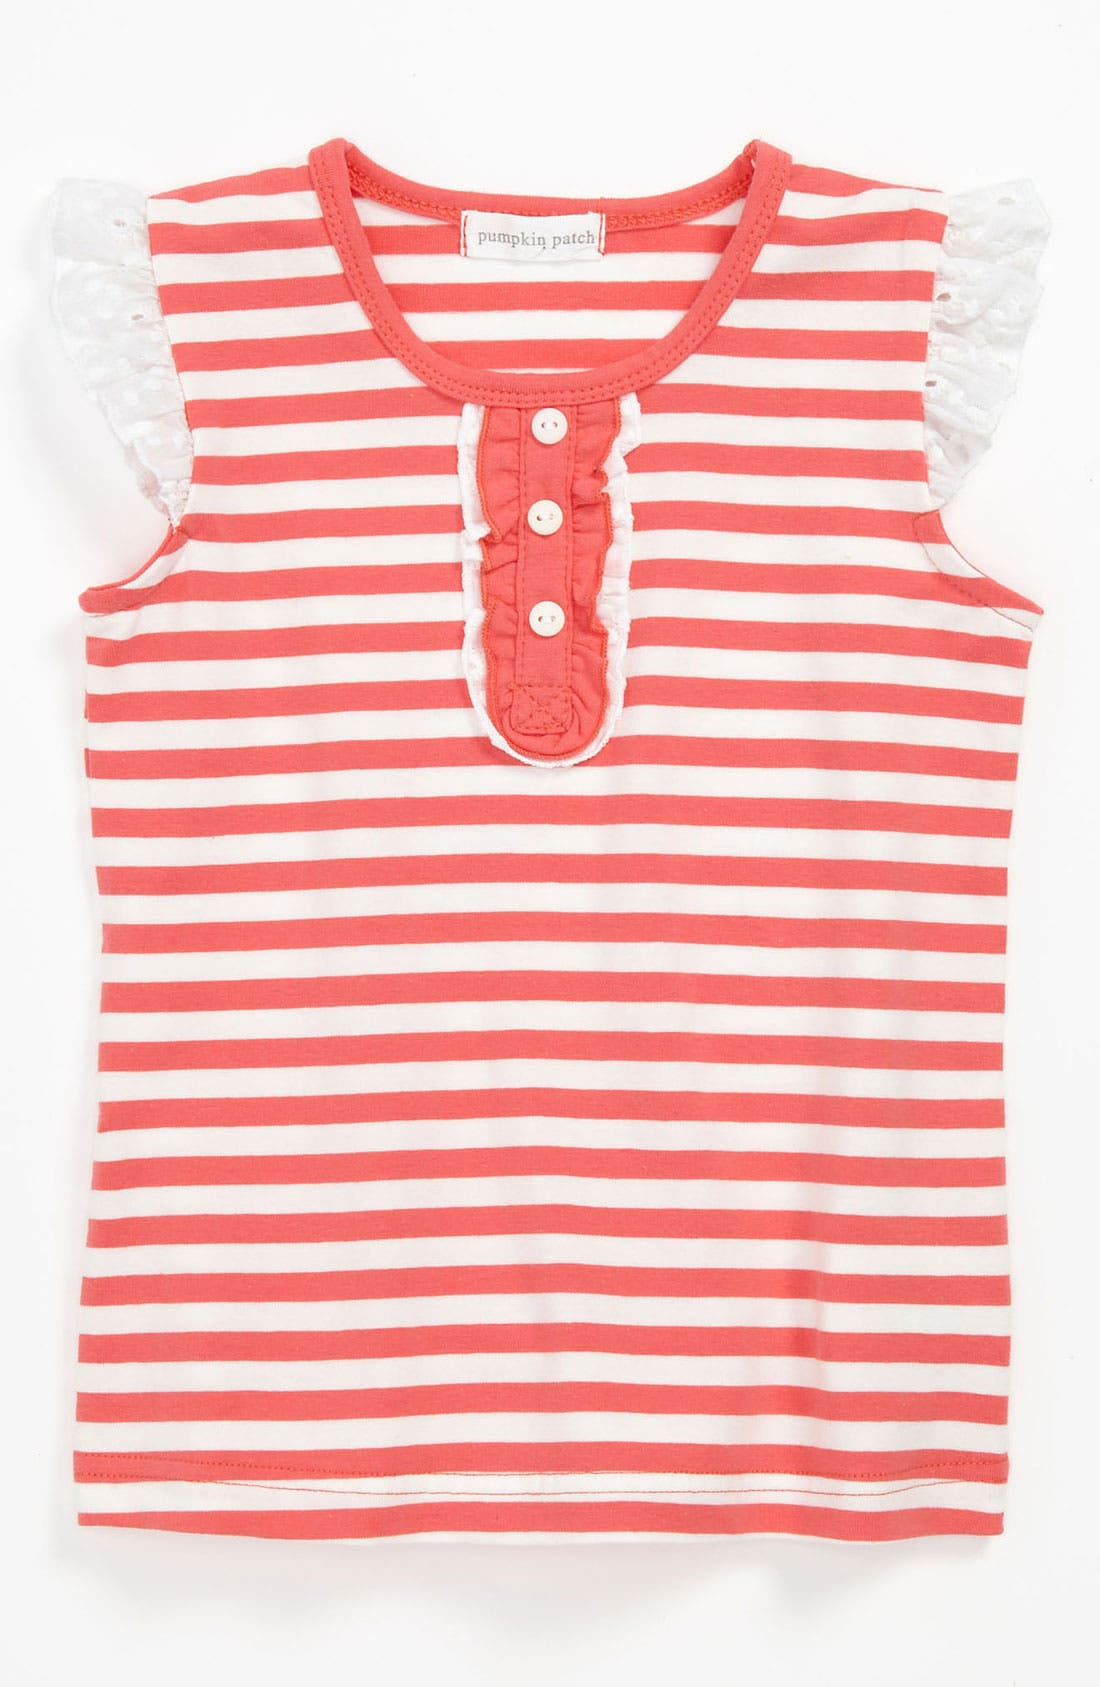 Main Image - Pumpkin Patch Skinny Stripe Top (Toddler)